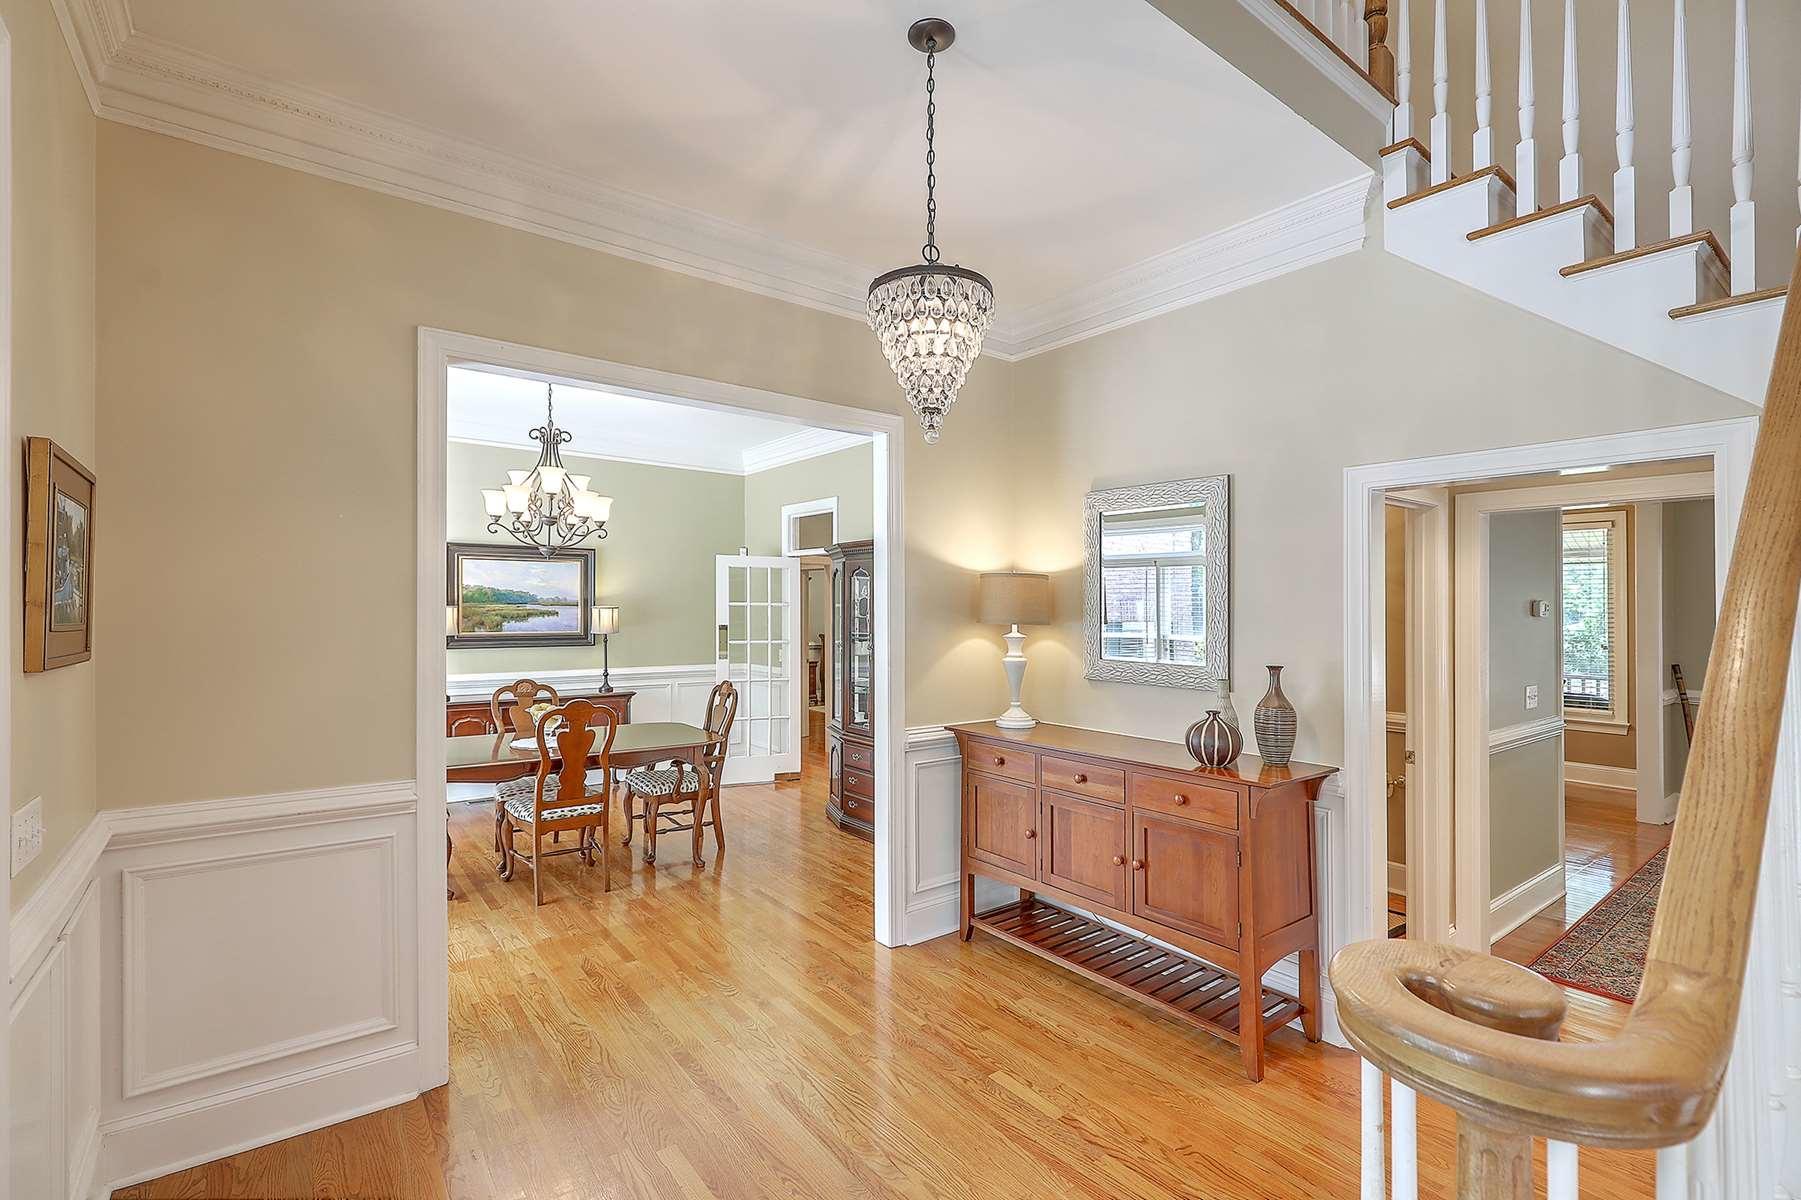 Dunes West Homes For Sale - 2961 Pignatelli, Mount Pleasant, SC - 33